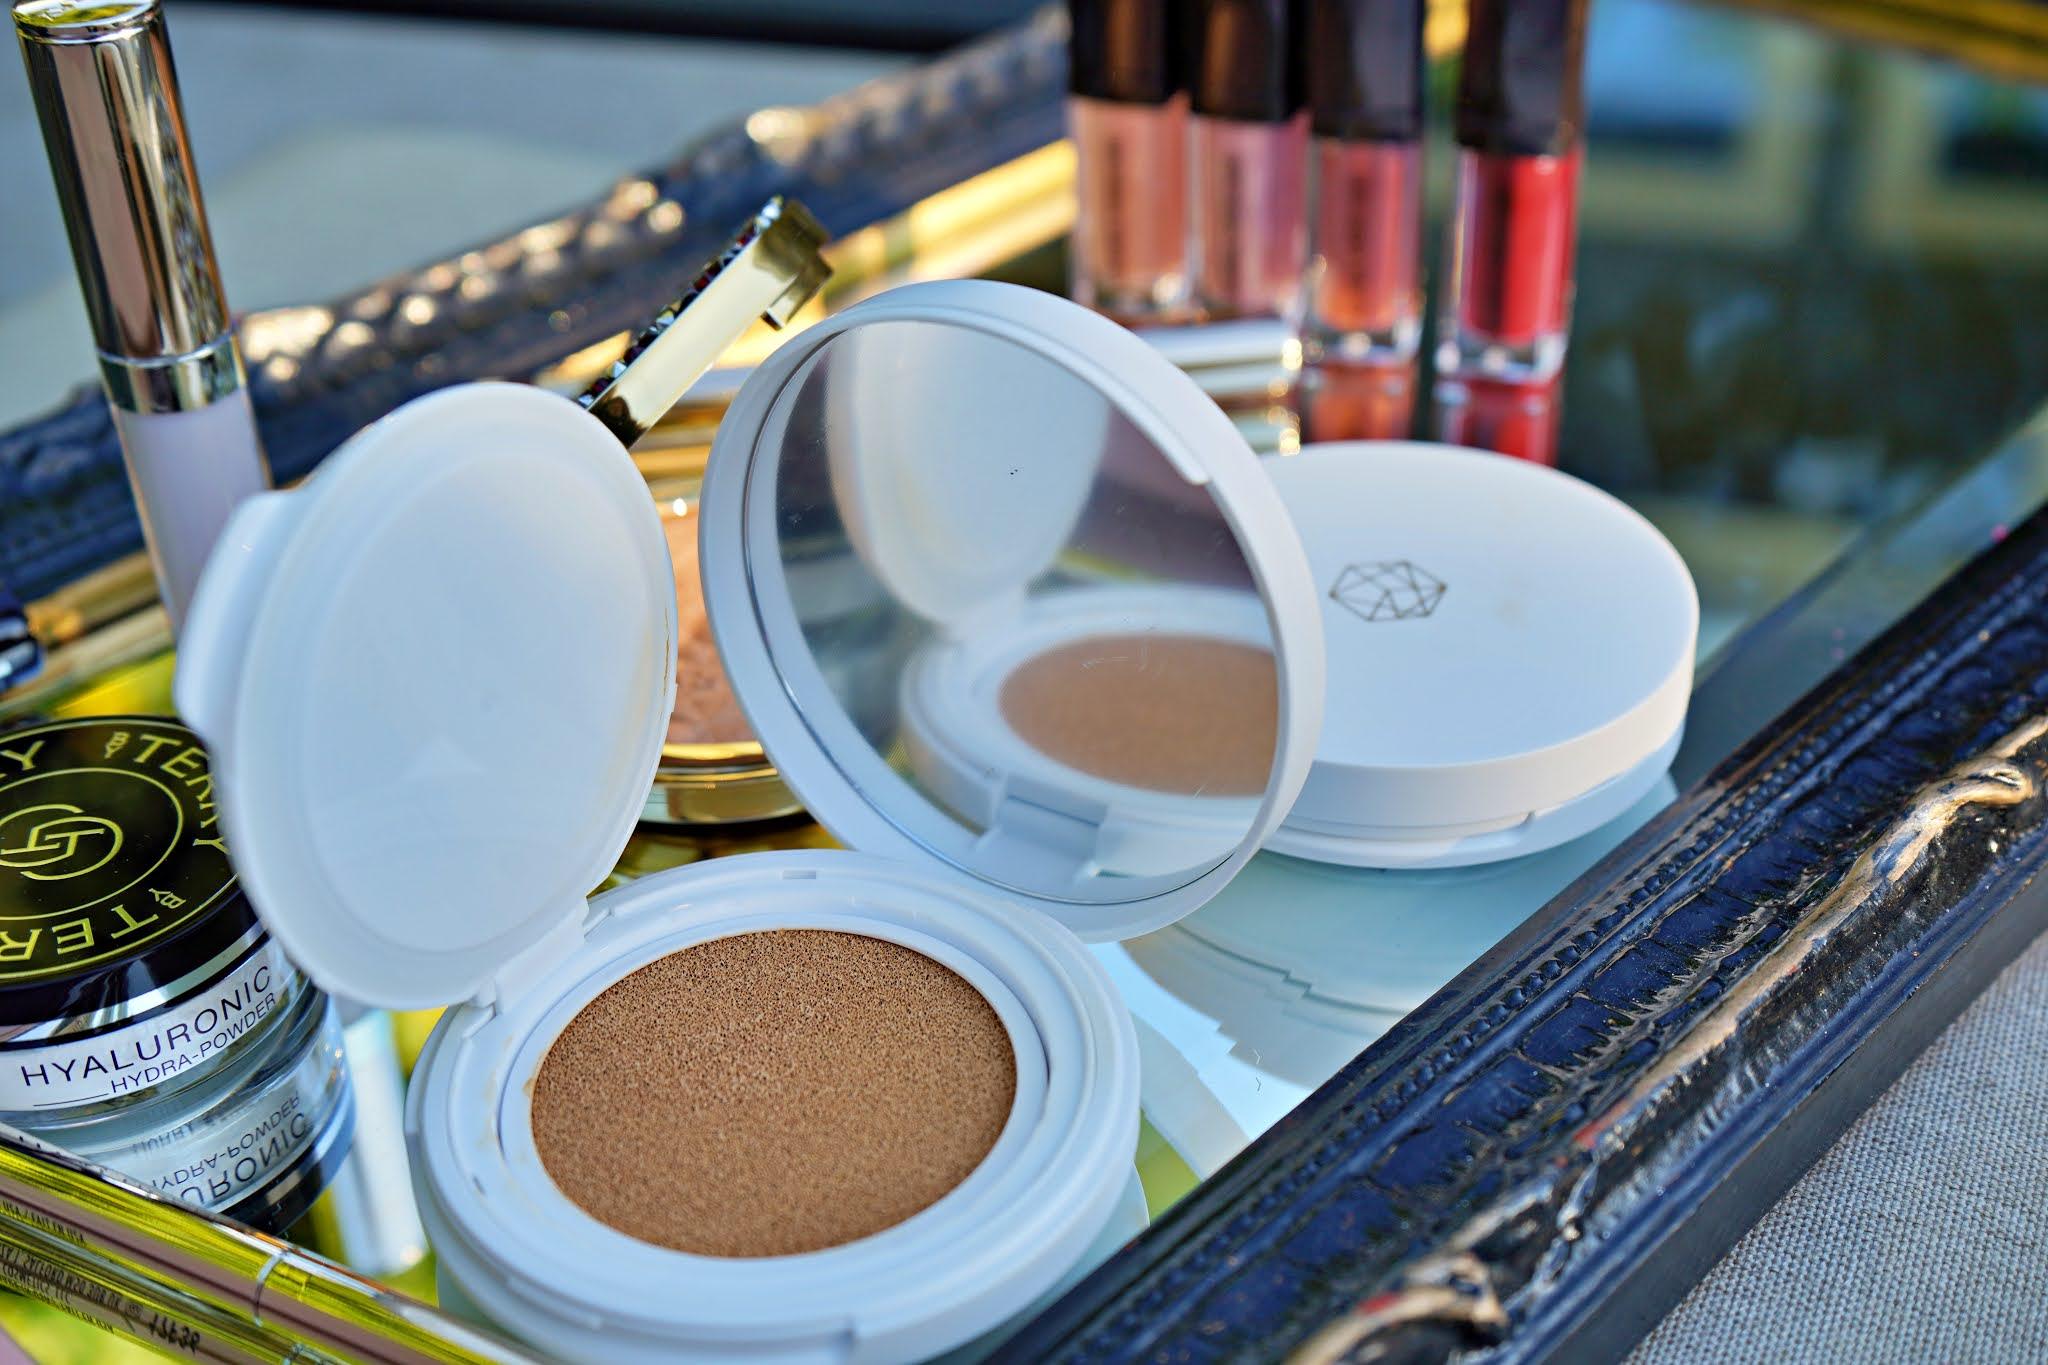 EM Cosmetics Daydream Cushion in Sweet Secret products